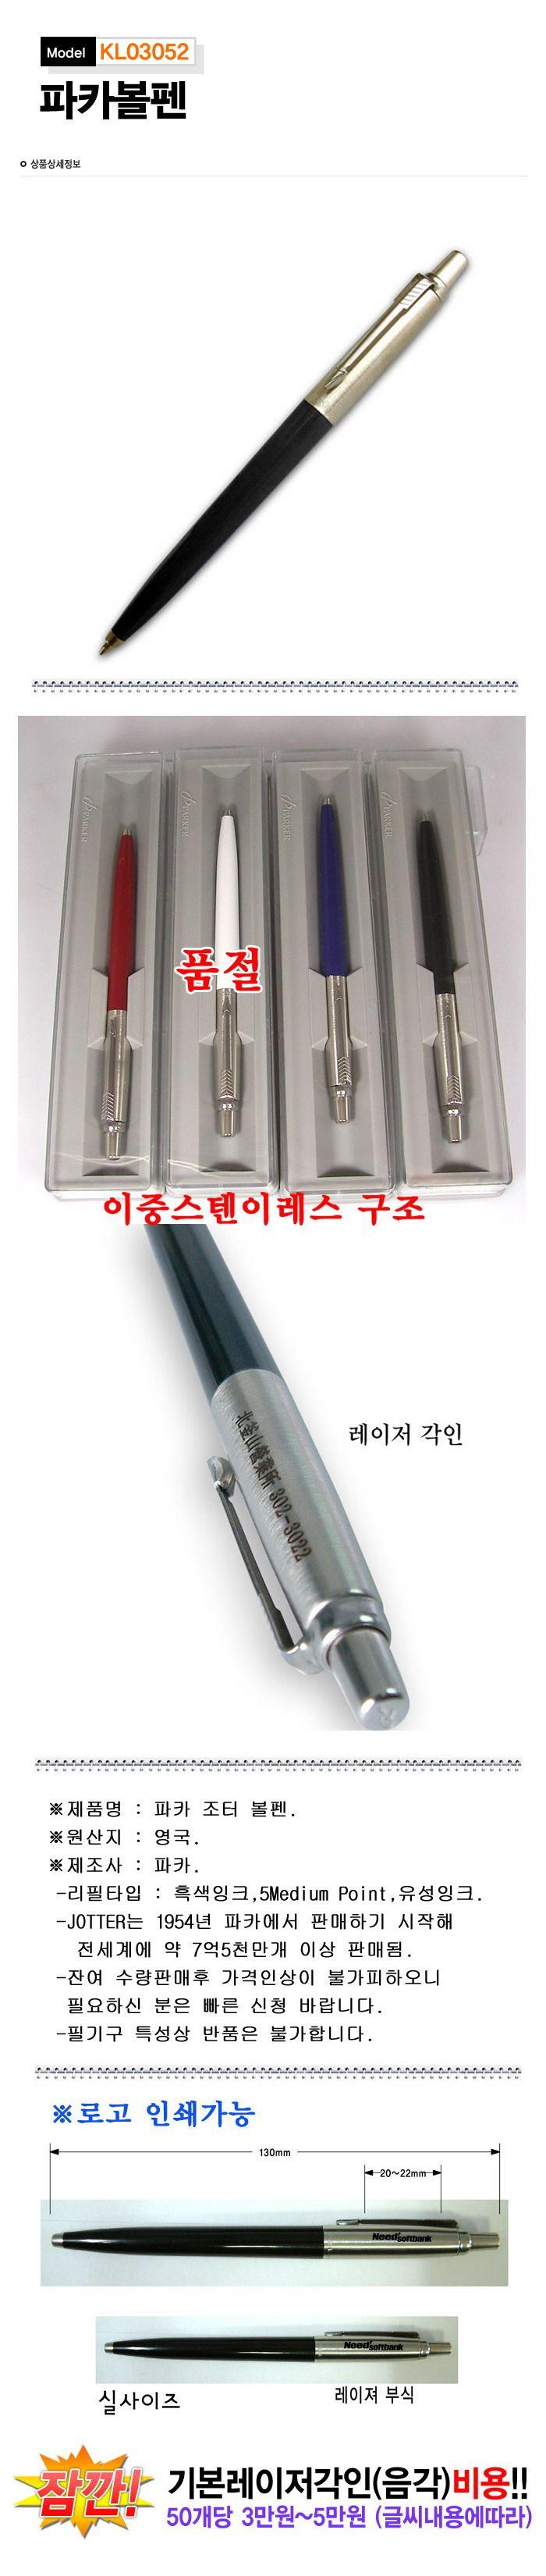 KLPKOREA INC [KL03052[100개가격]파카조터볼펜/단체/홍보/로고인쇄가능/인쇄비별도]